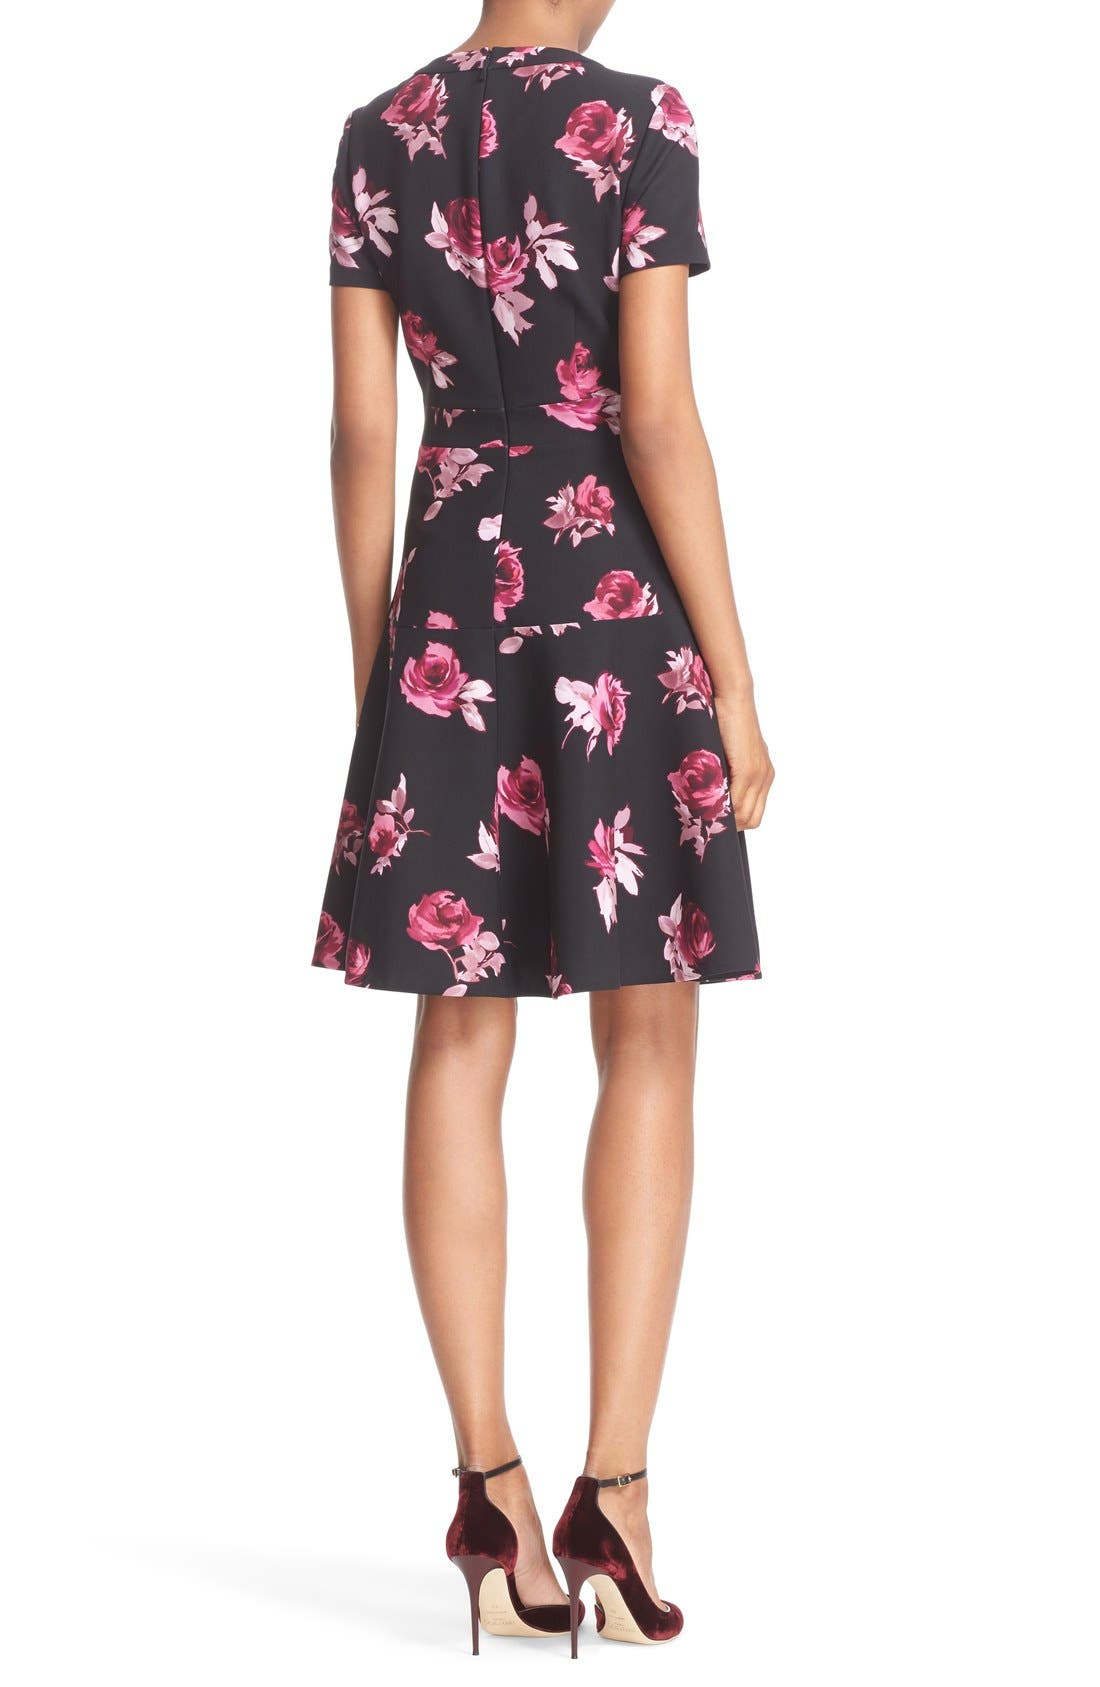 KATE SPADE NEW YORK, 'encore rose' crepe fit & flare dress, Alternate thumbnail 3, color, 001